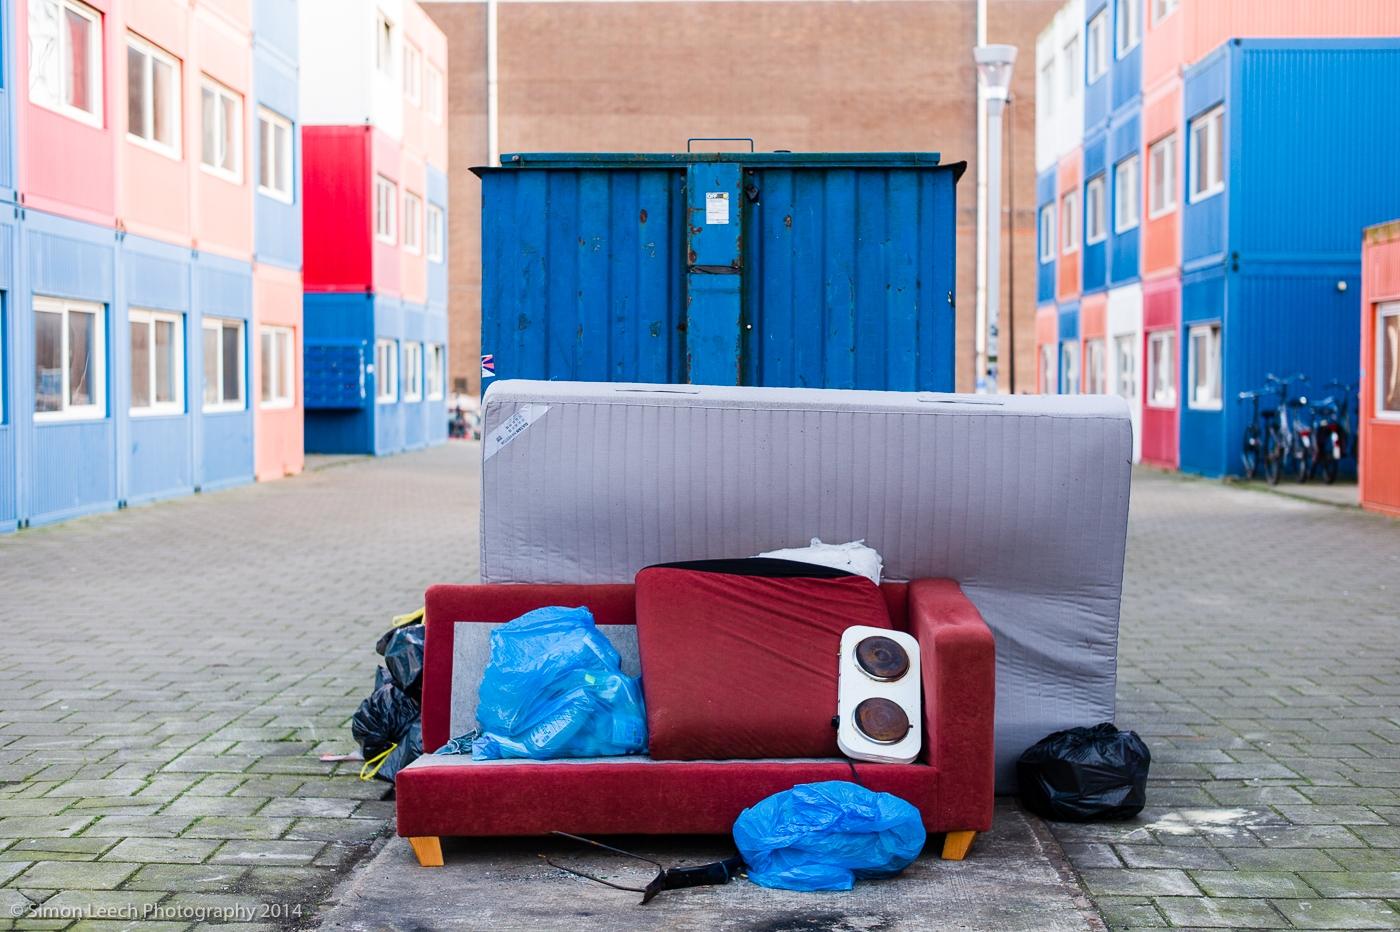 Student Accommodation at NDSM